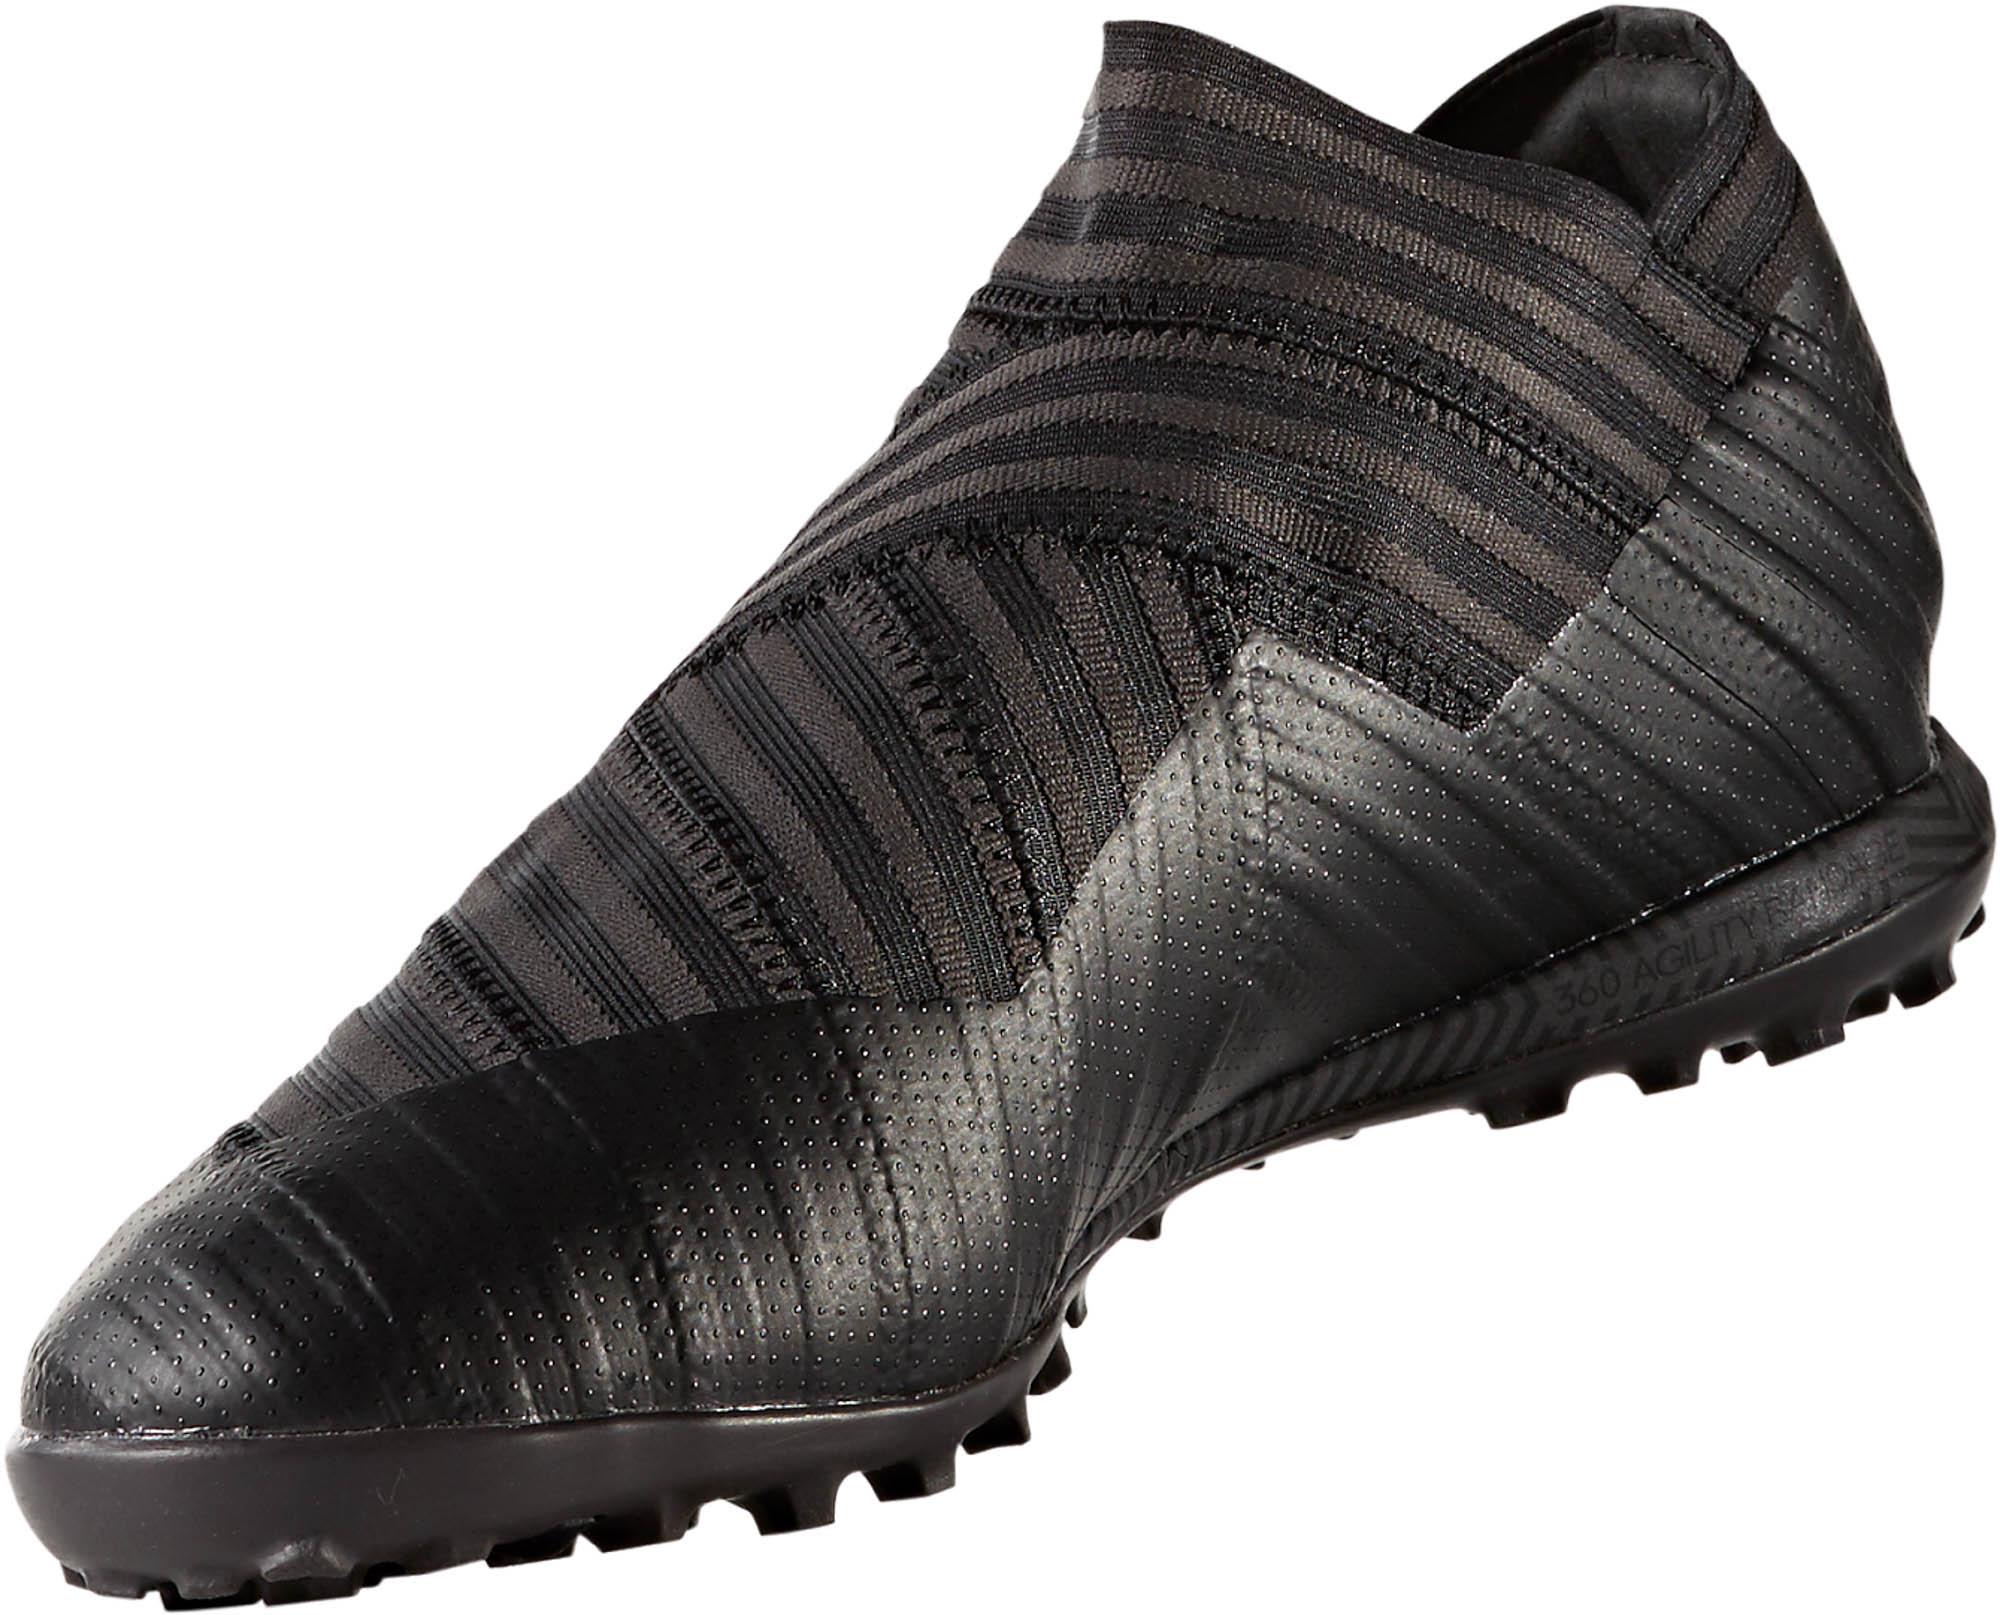 adidas Nemeziz Tango 17 360Agility Black adidas Cleats